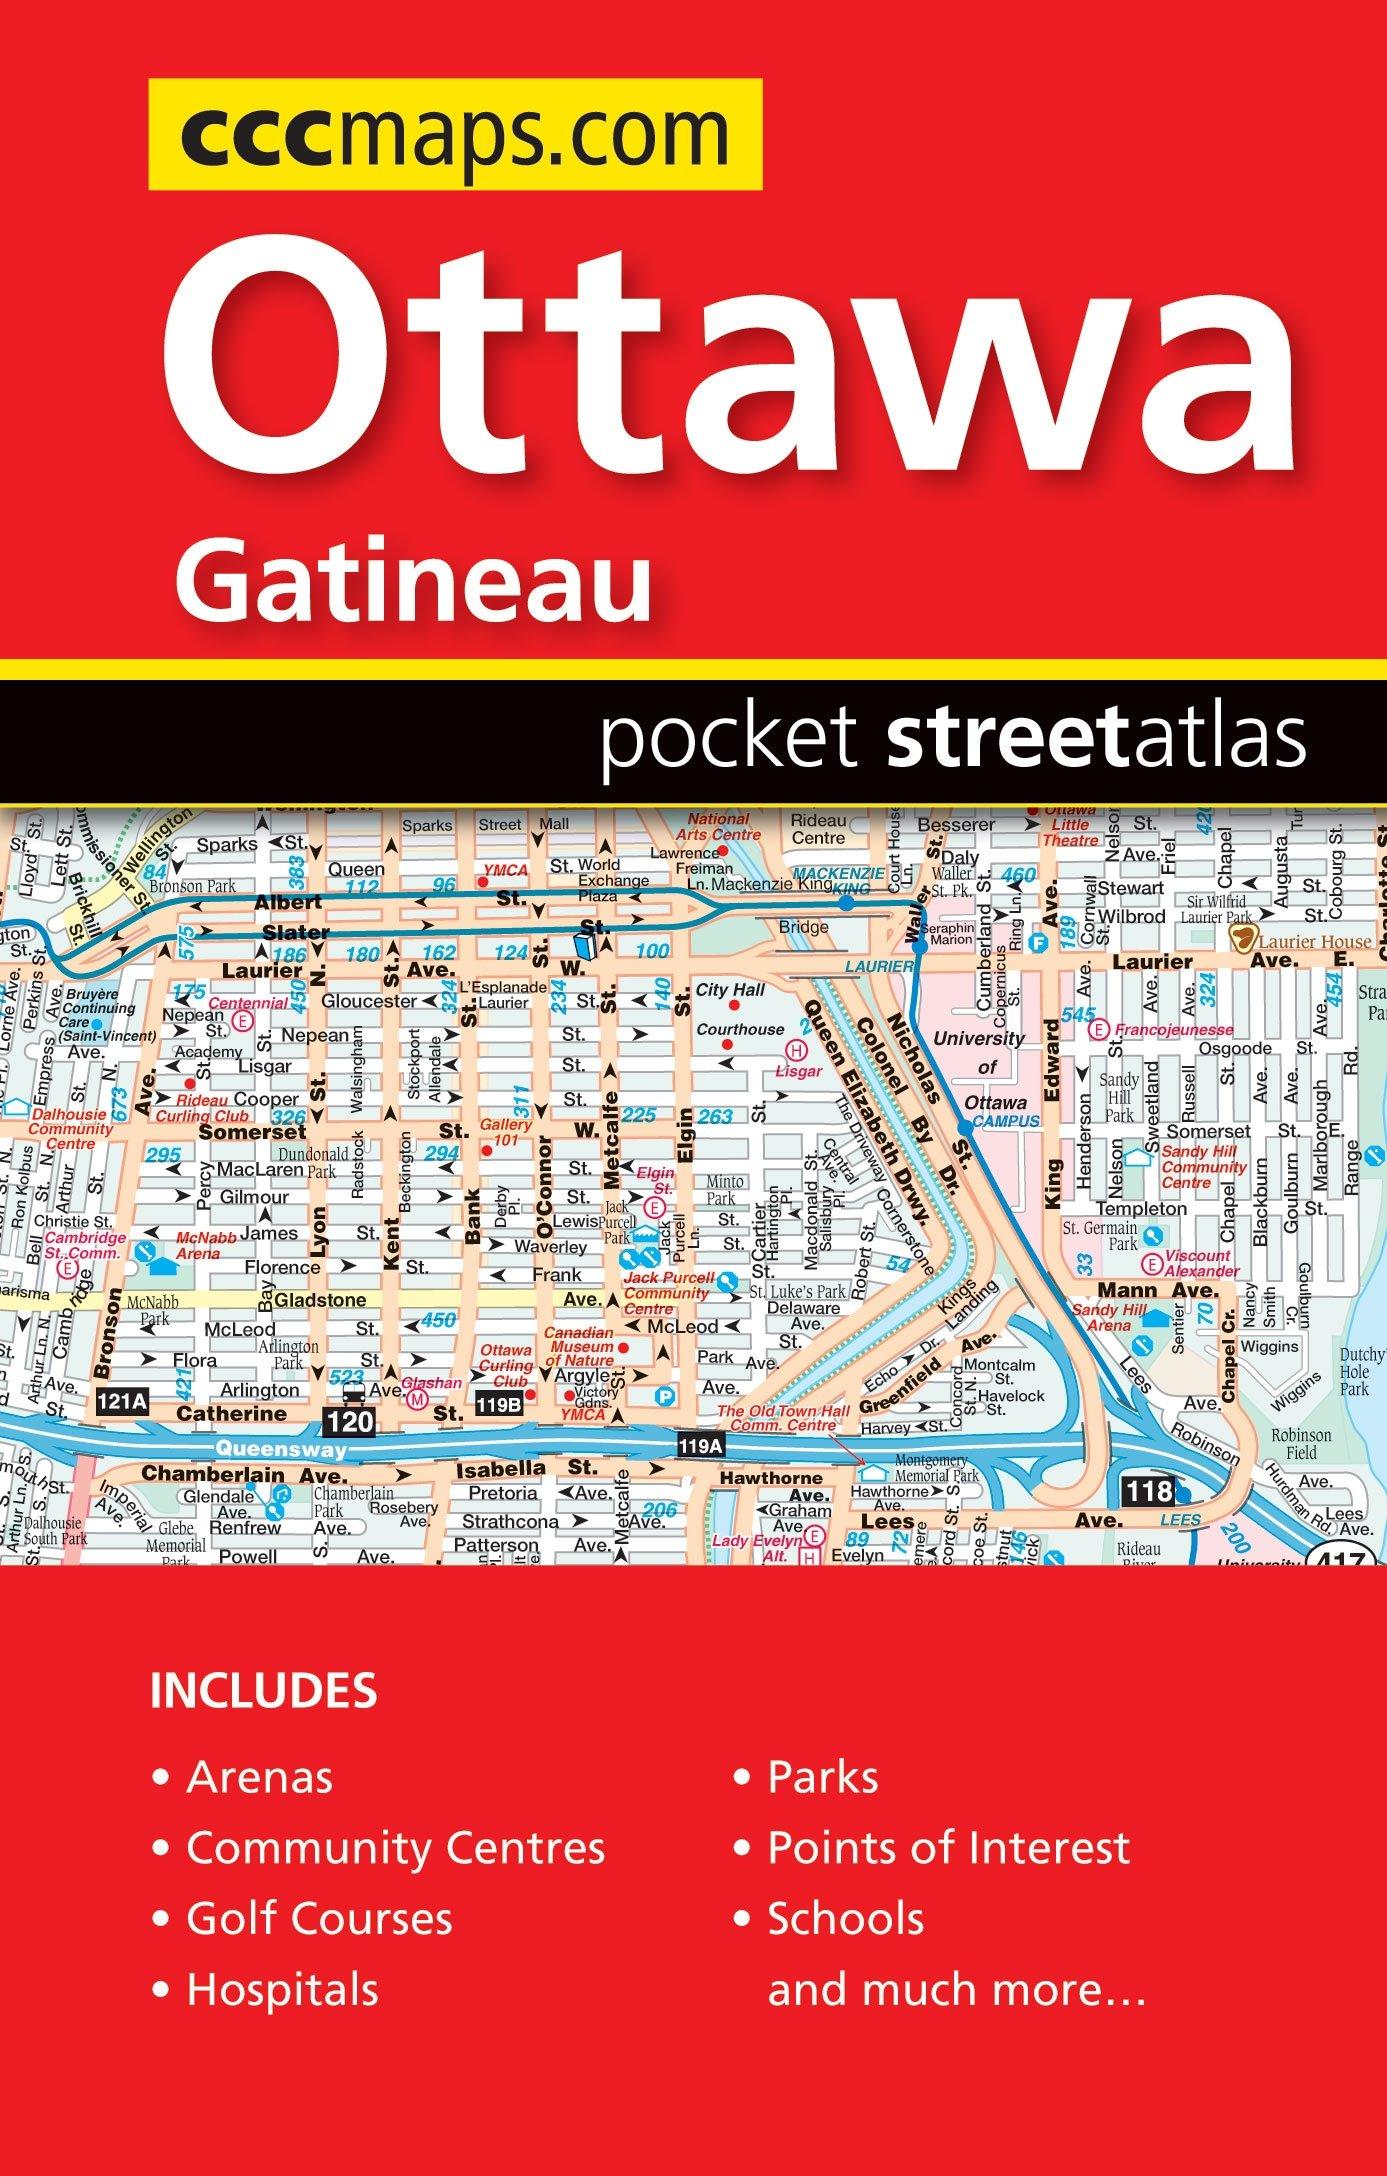 WRG-4838] Ottawa Fast Track Fast Track Mapart on